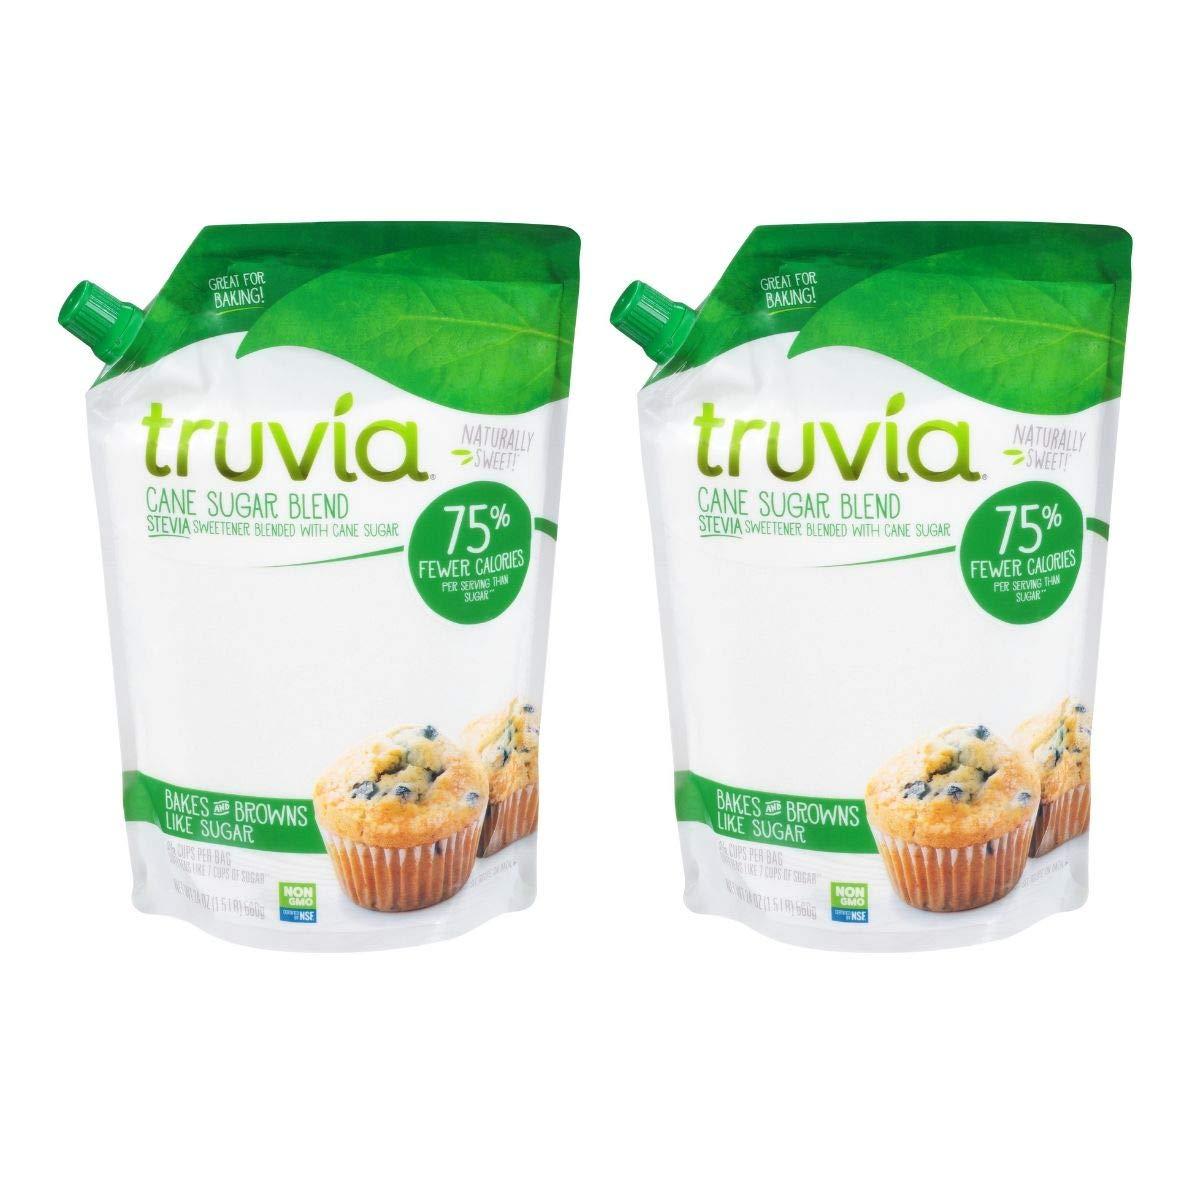 Truvia Baking Blend 1.5 lb. Bag (Pack of 2)